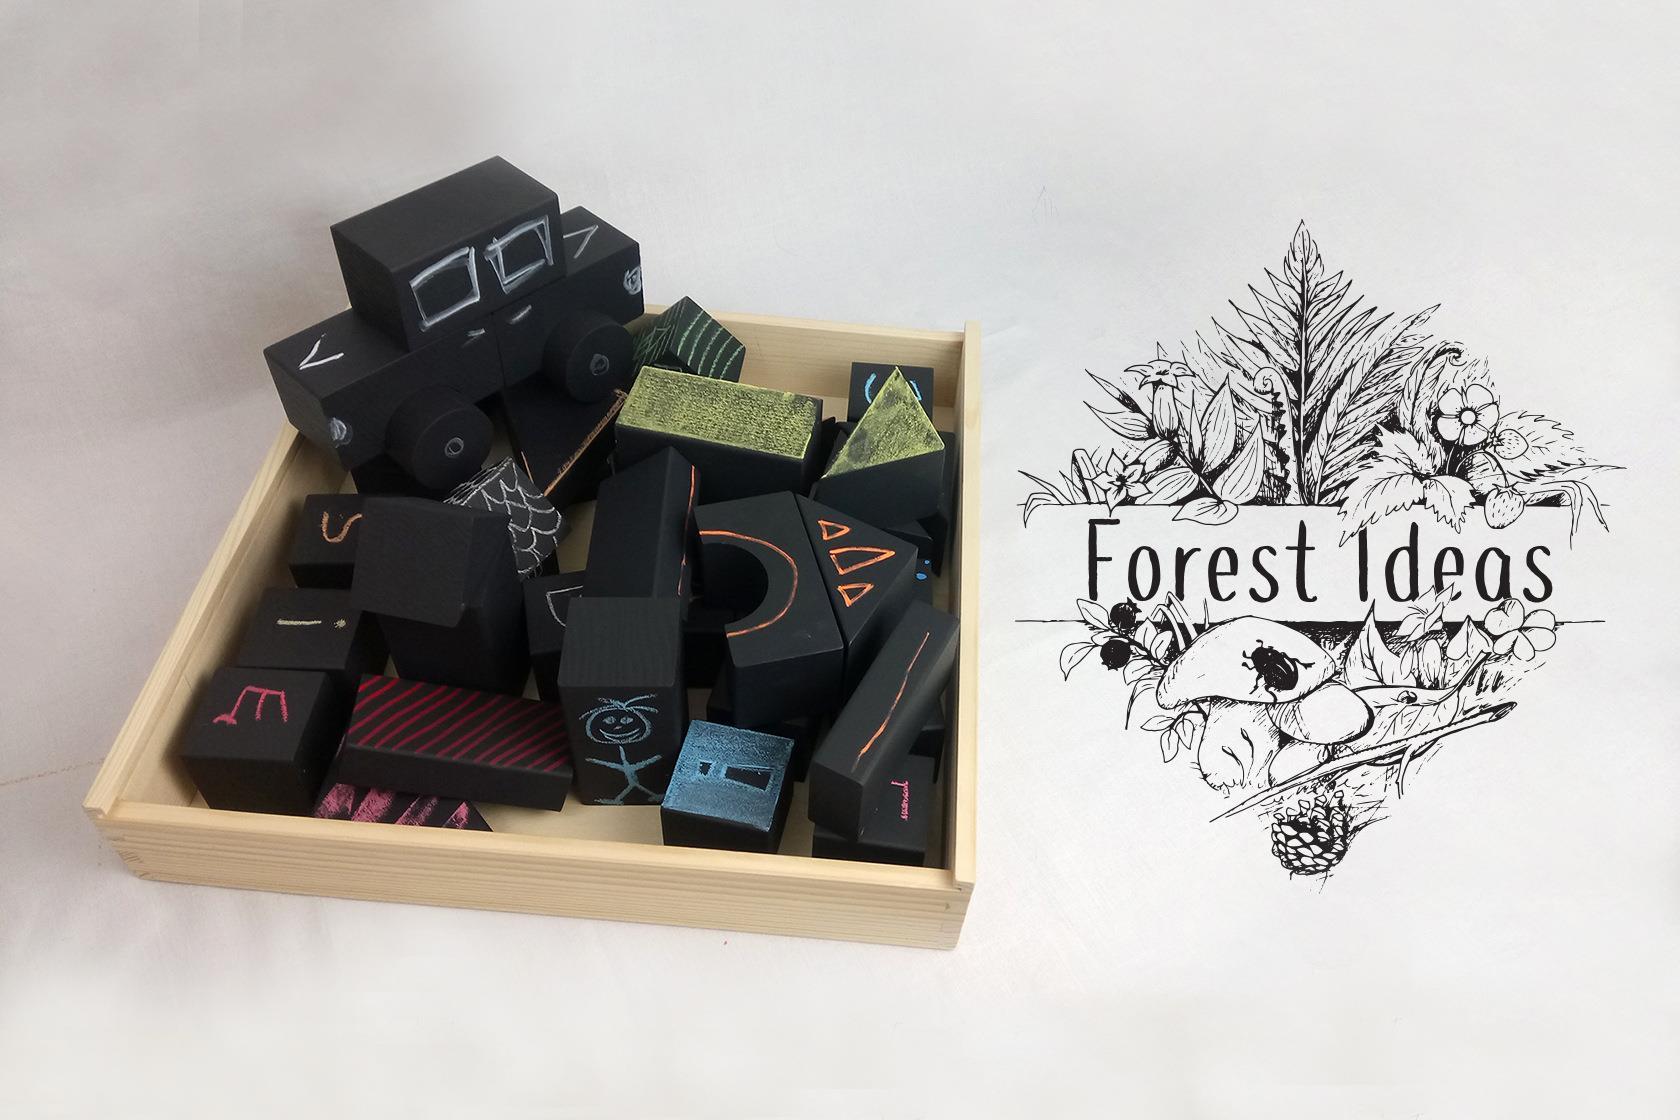 Klocki Forest Ideas